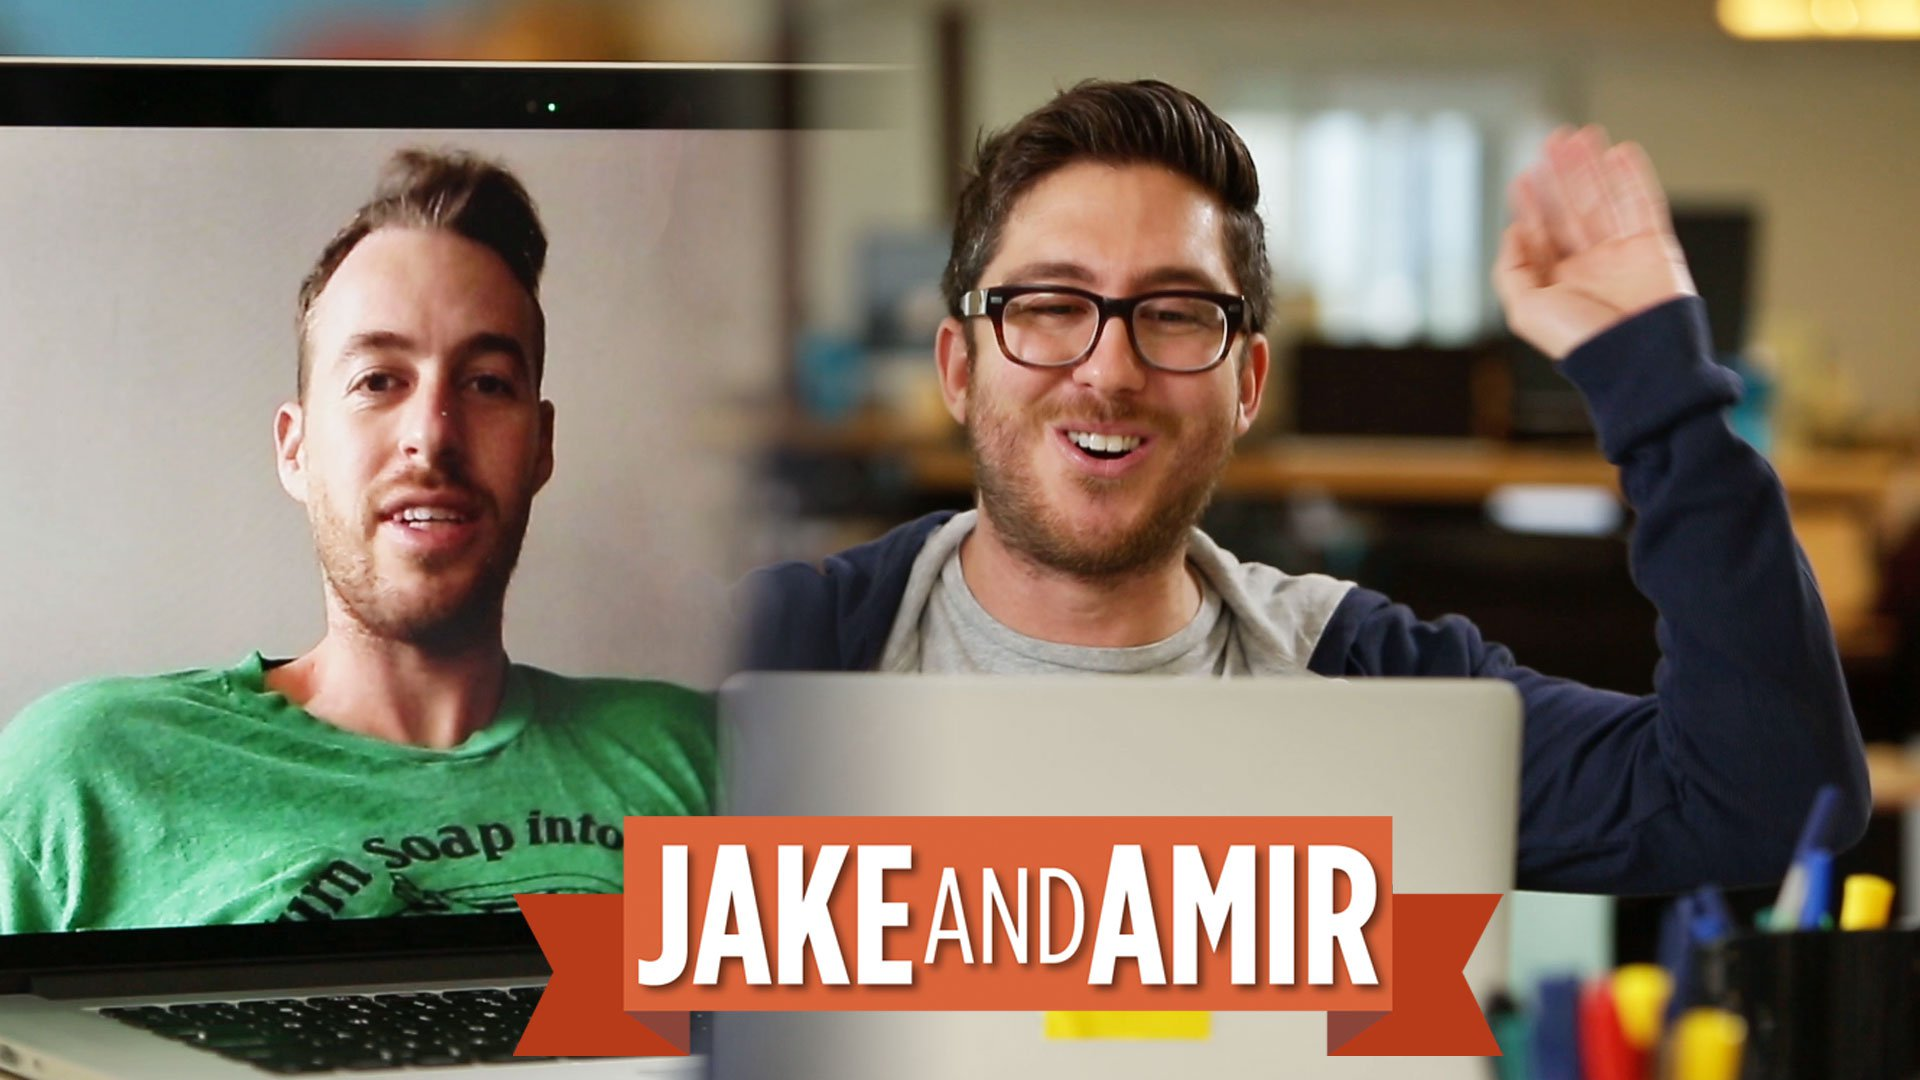 Jake And Amir Wallpaper